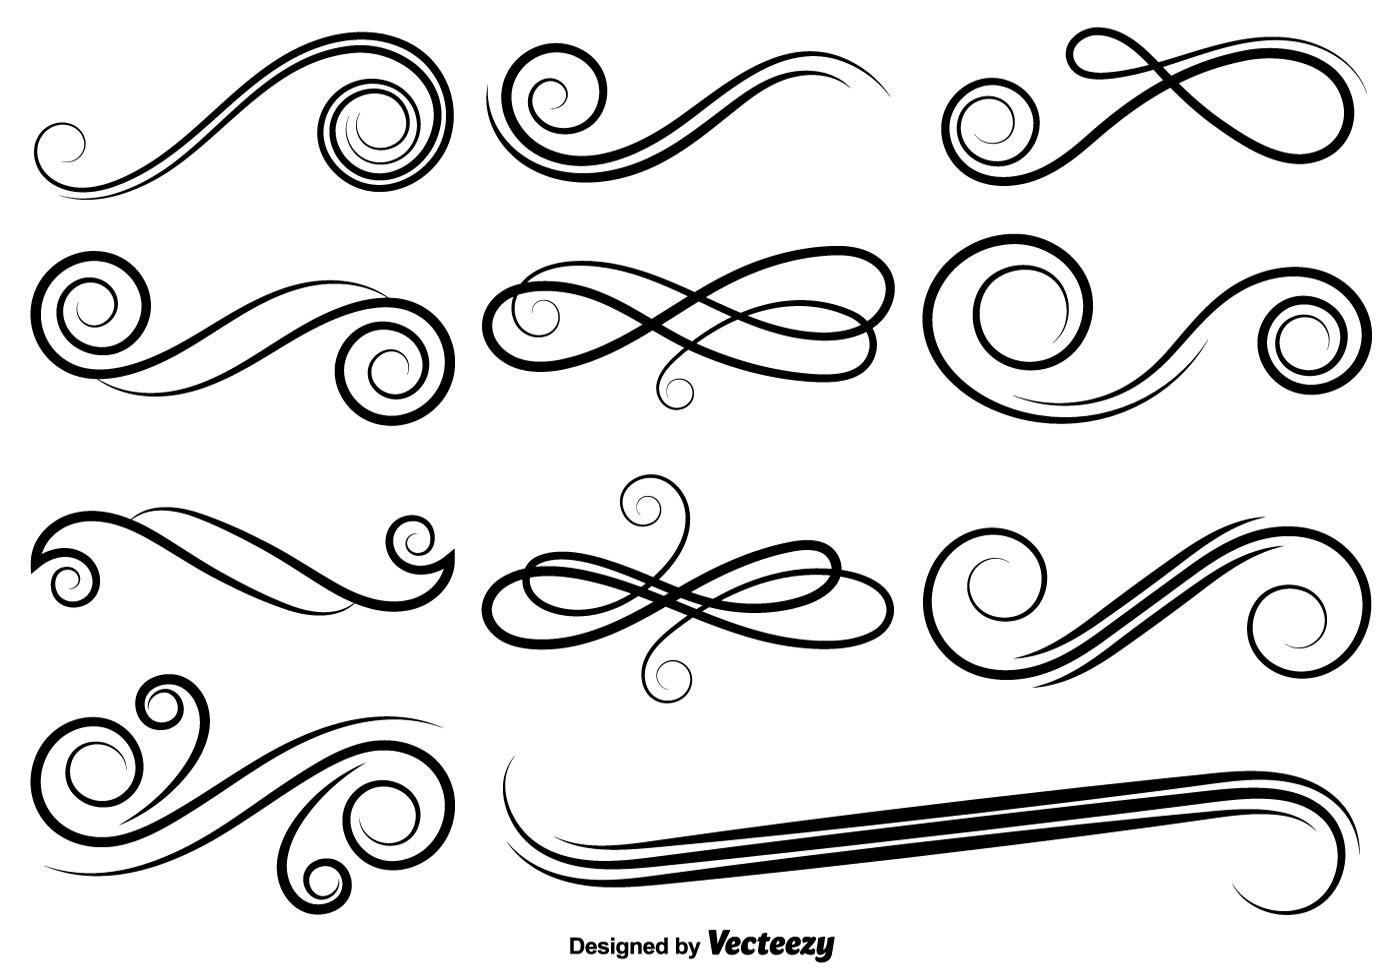 flourish free vector art - (15179 free downloads)